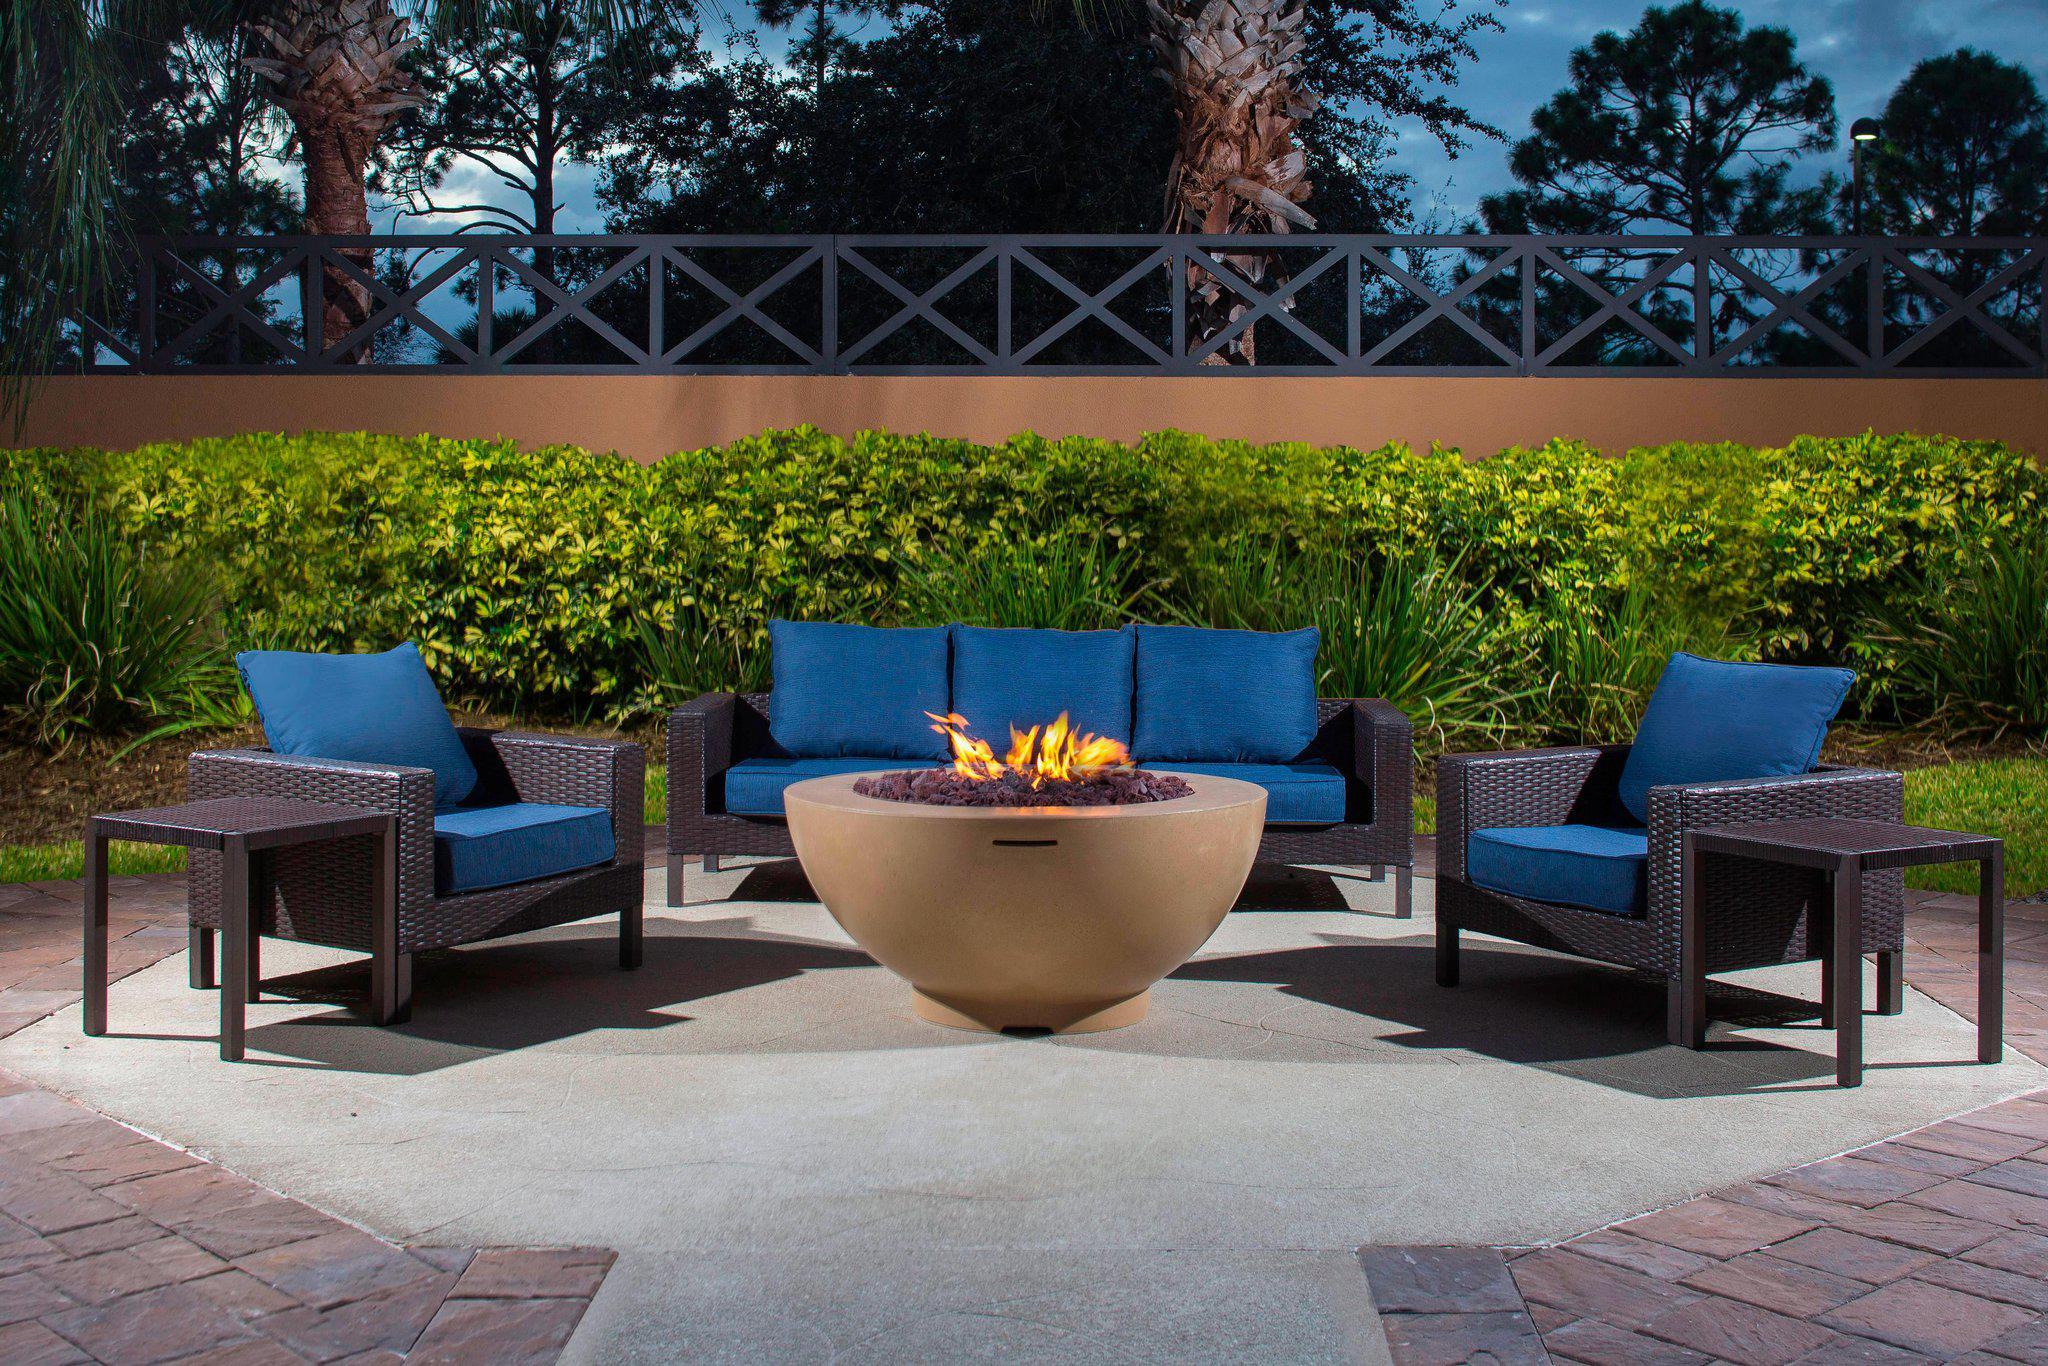 Courtyard by Marriott Daytona Beach Speedway/Airport